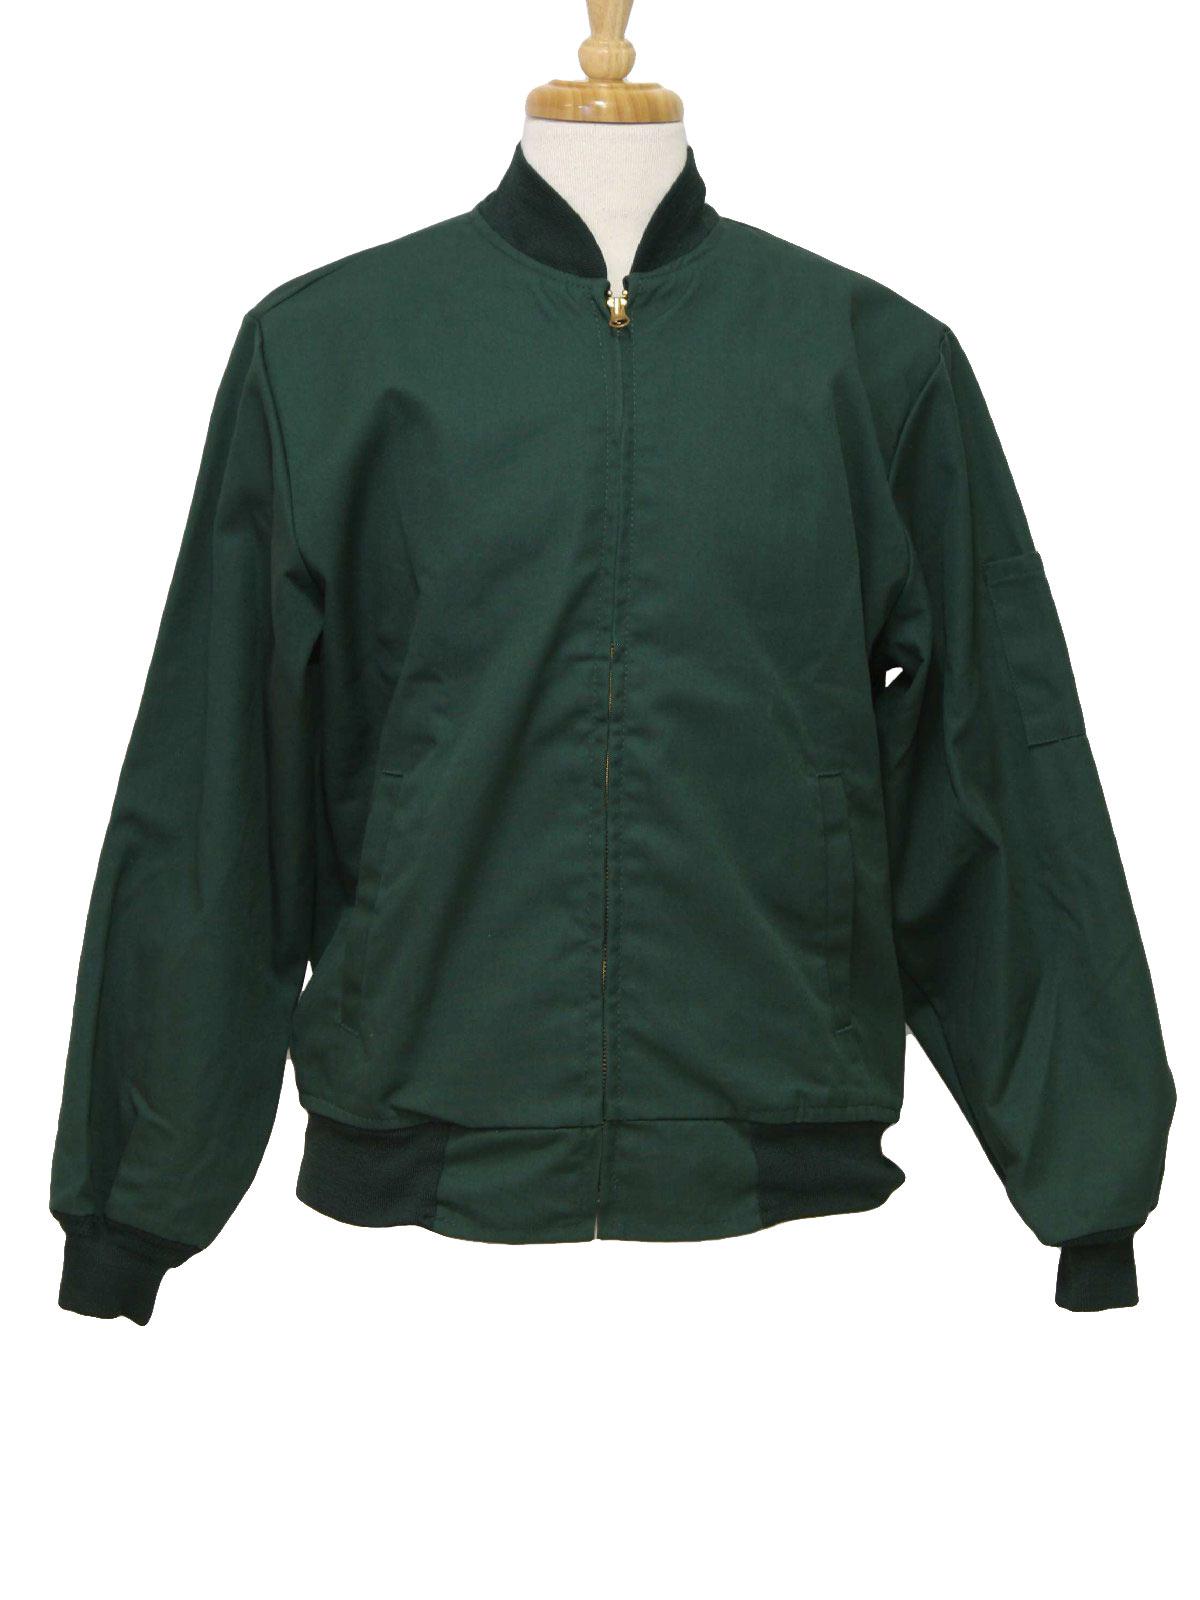 Green Work Jacket - JacketIn